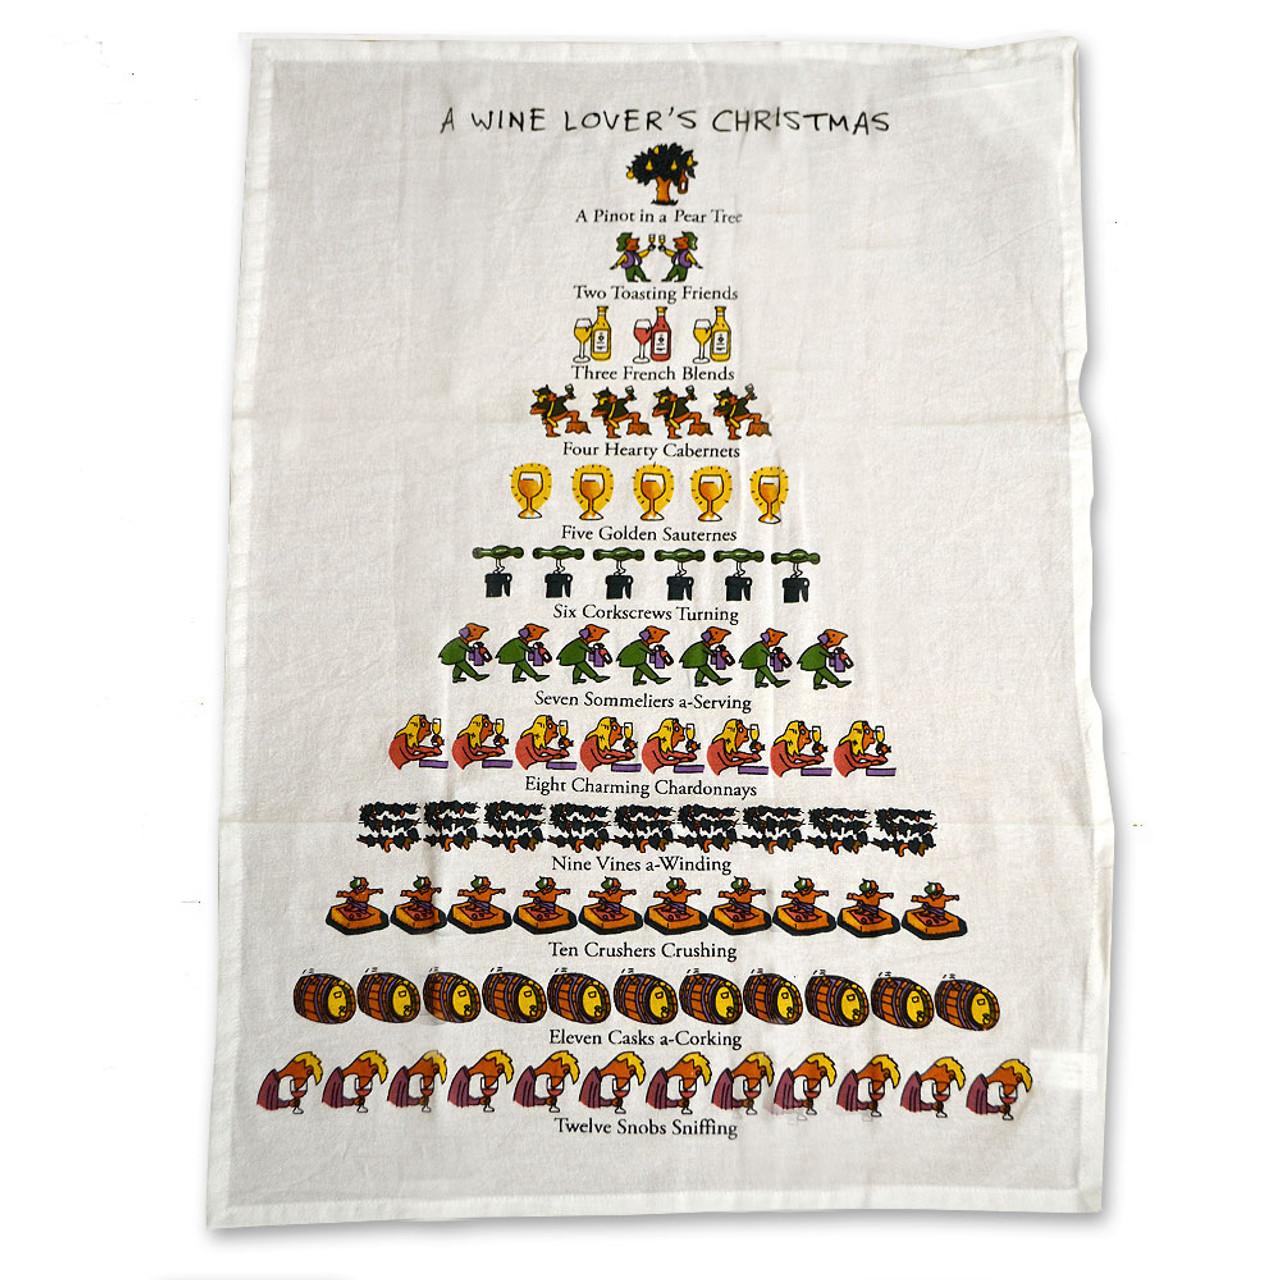 12 Days of Christmas Wine Towel